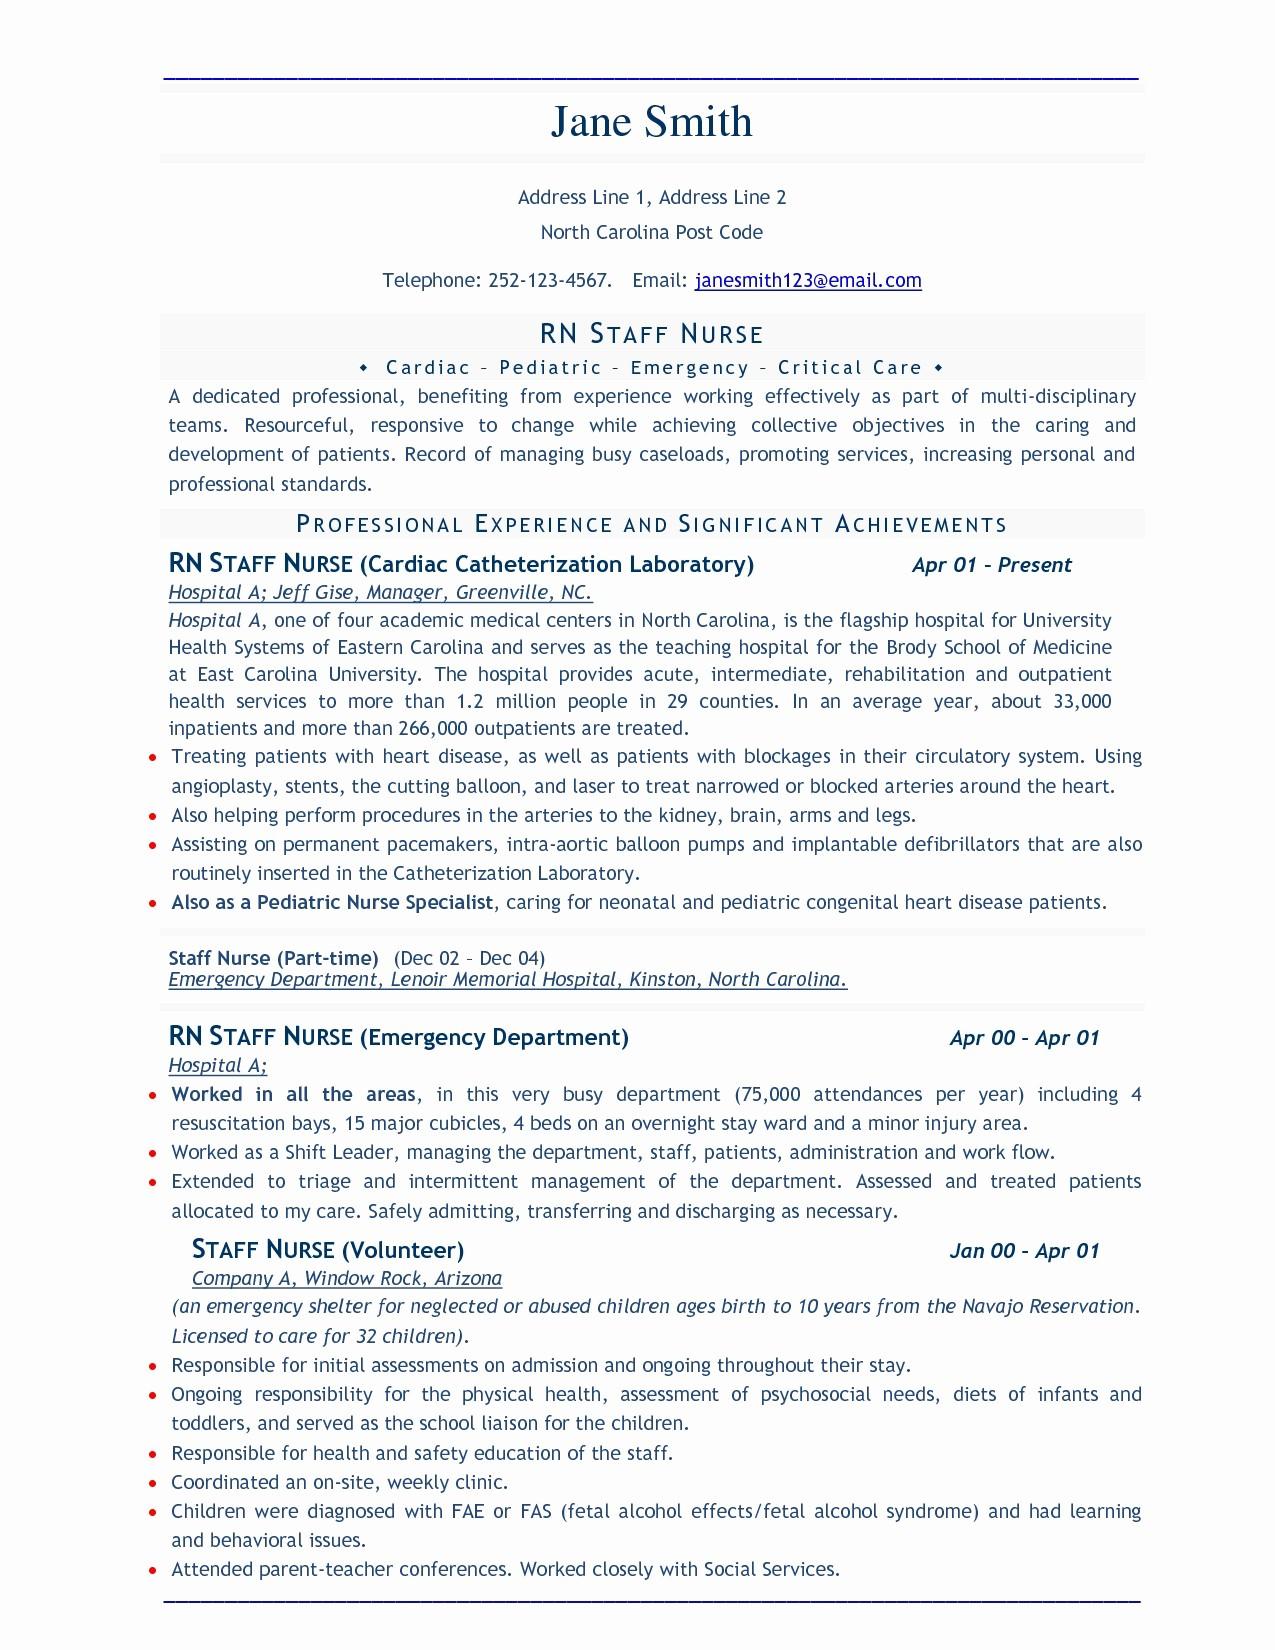 Sample Resume Templates Free Download Beautiful Downloadable Resume Templates